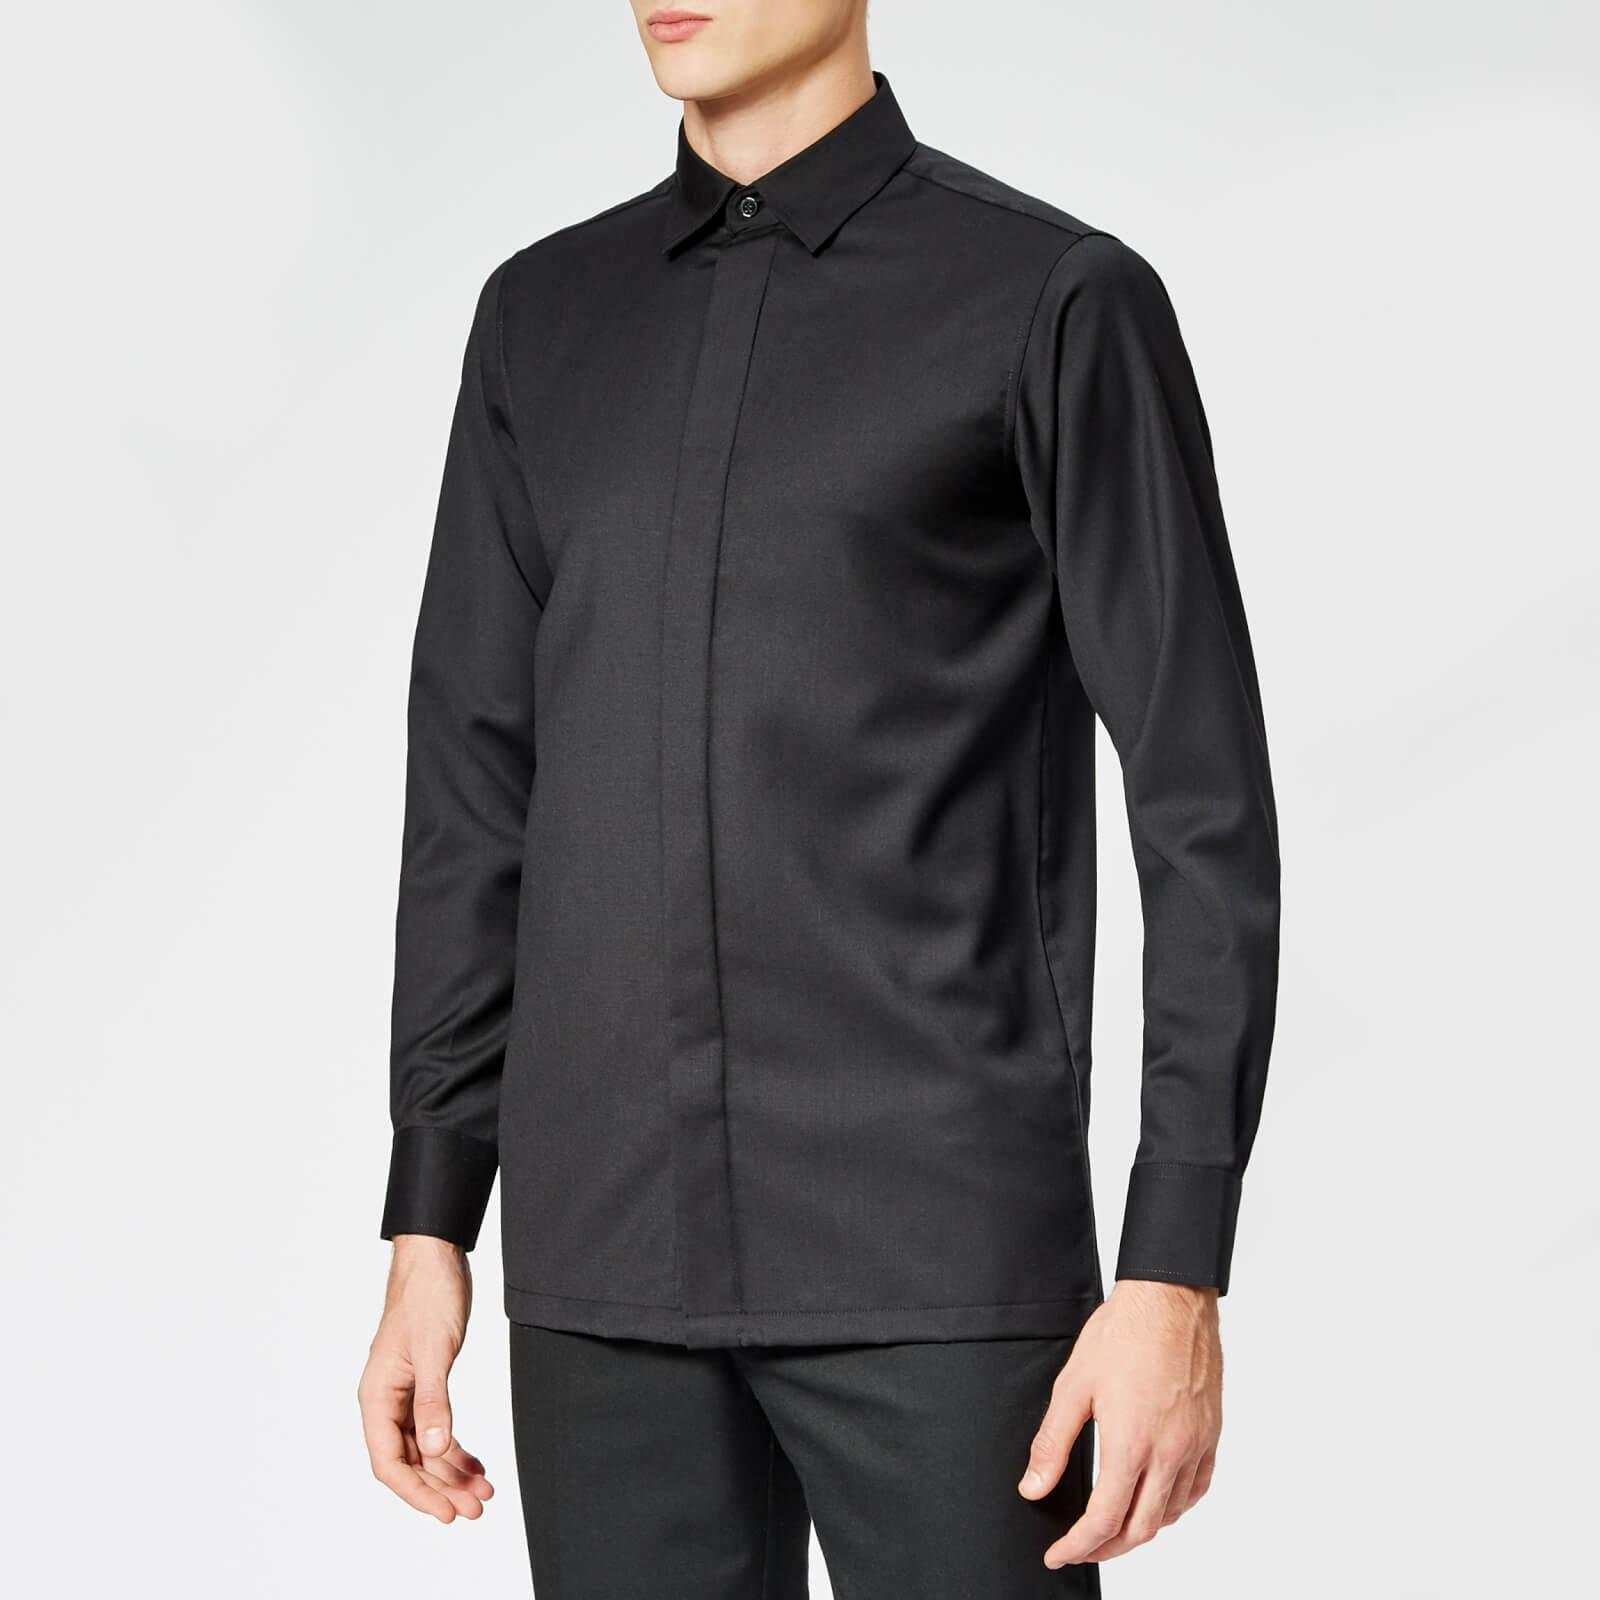 Matthew Miller Cahir Merino Wool Shirt in Black for Men - Lyst